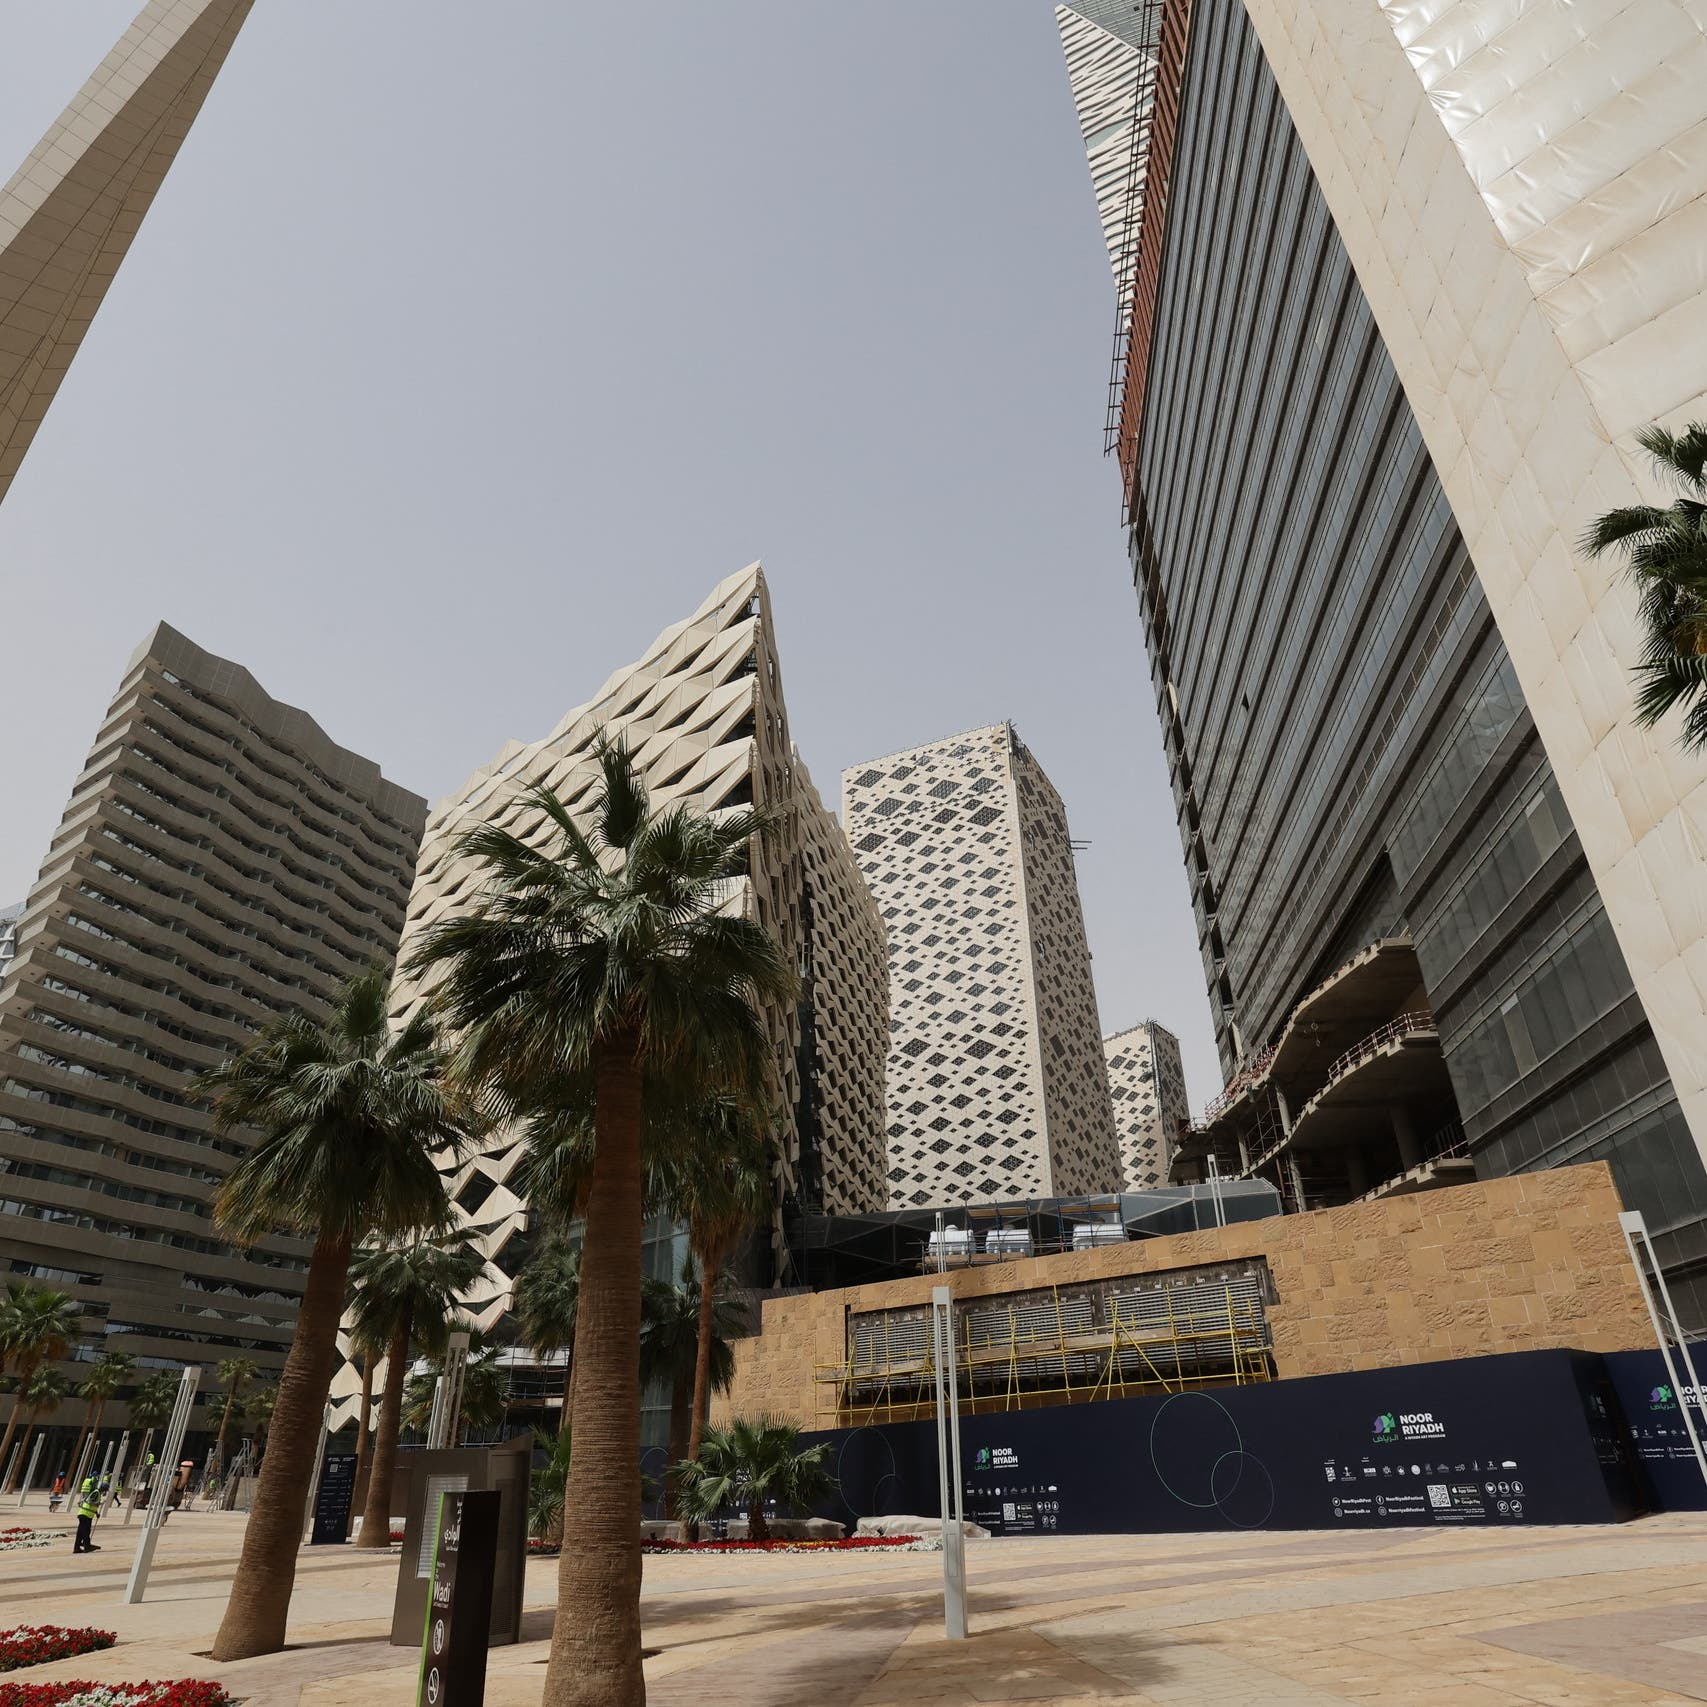 Saudi real estate market expanding at 'unprecedented rate,' mortgages up 10-fold